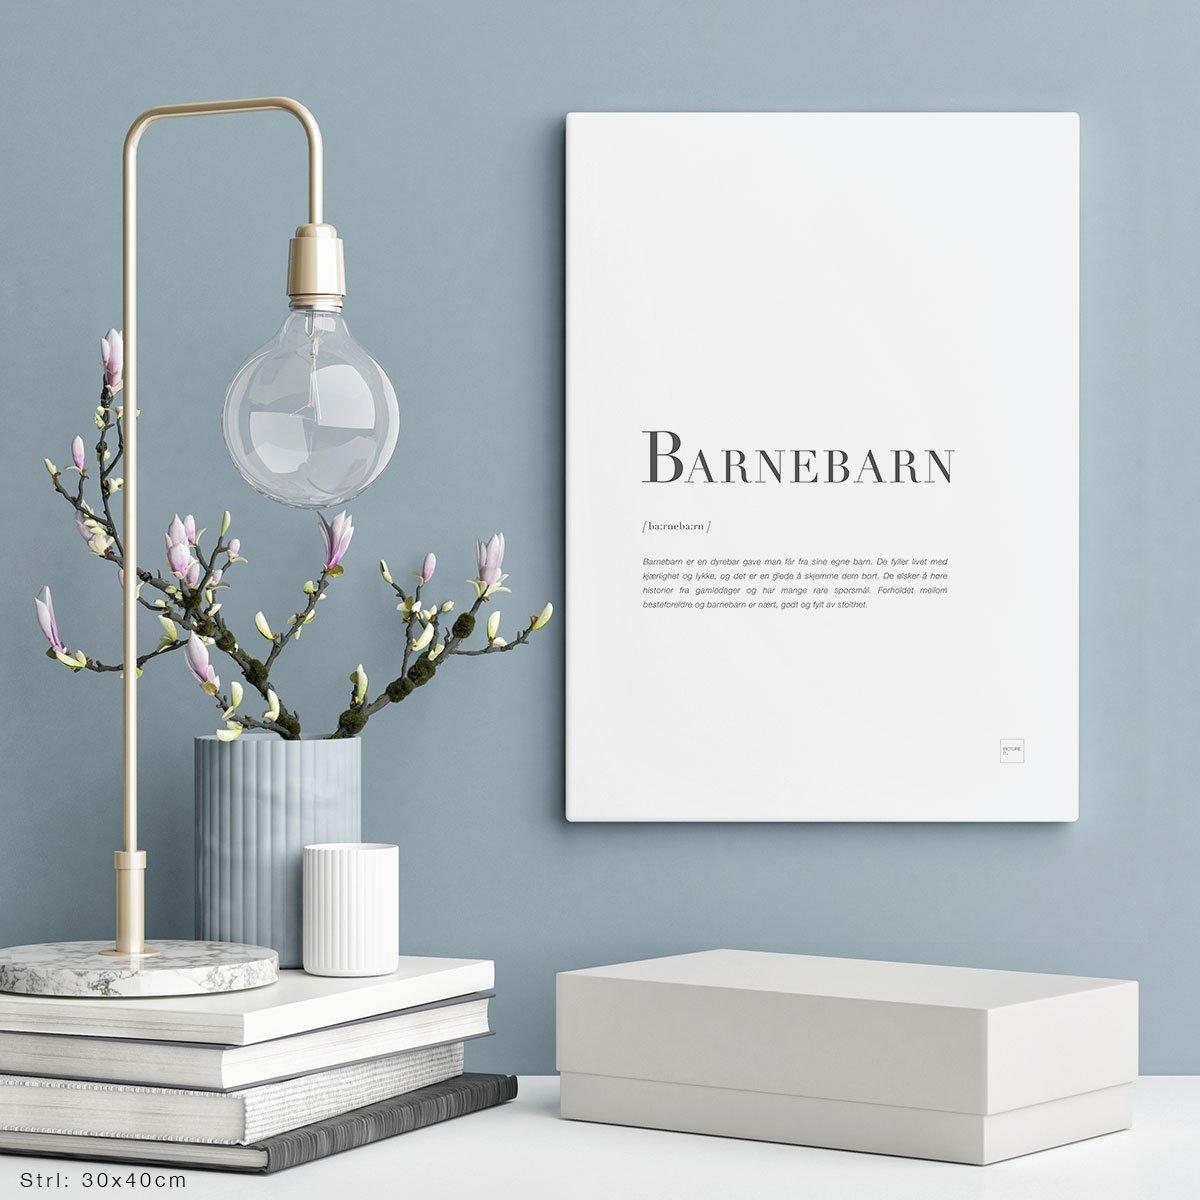 BARNEBARN-30x40cm